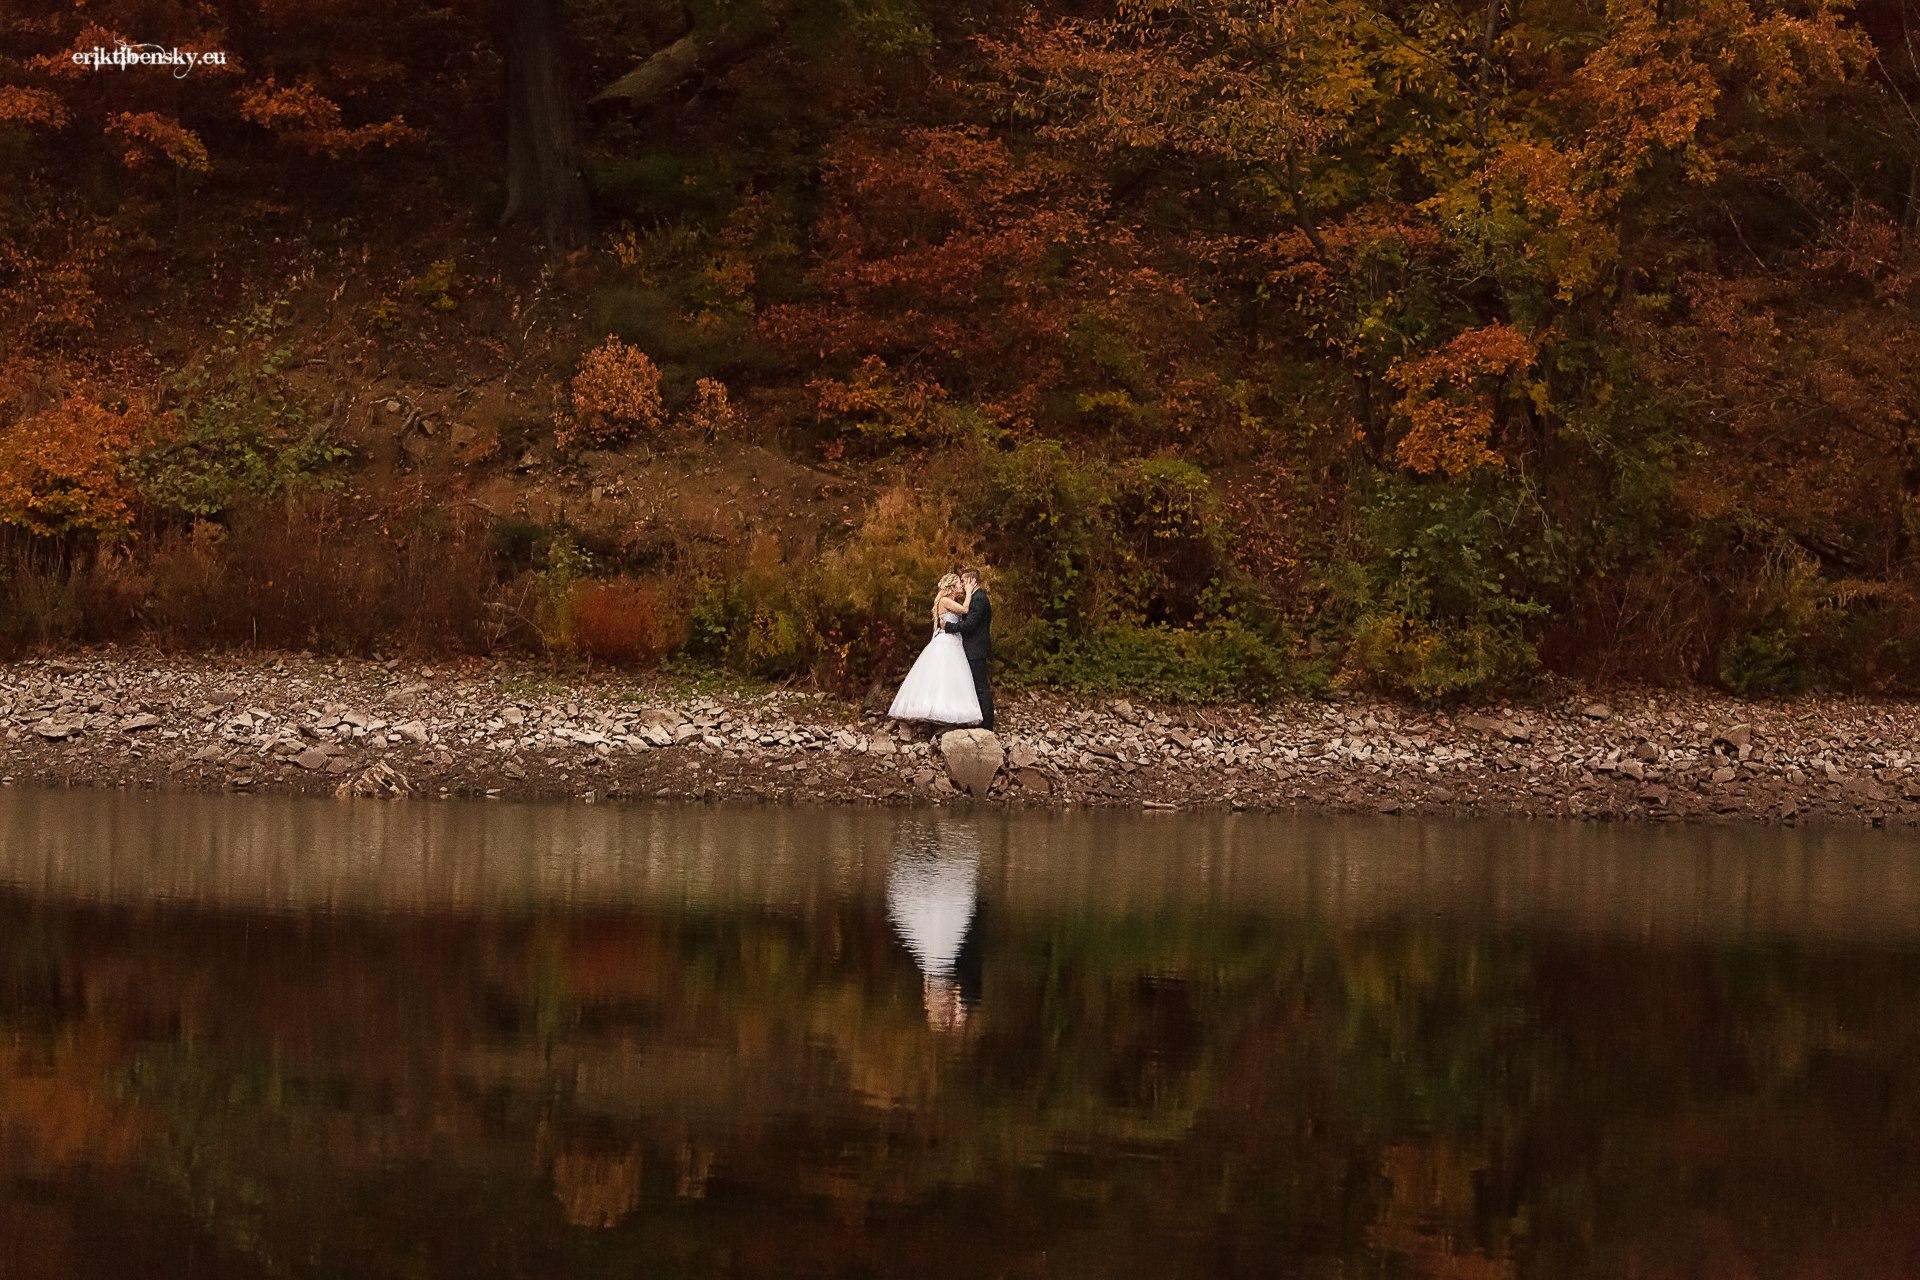 eriktibensky-eu-fotograf-wedding-photo-svadba-svadobny-pezinok-bratislava-modra-senec-1000